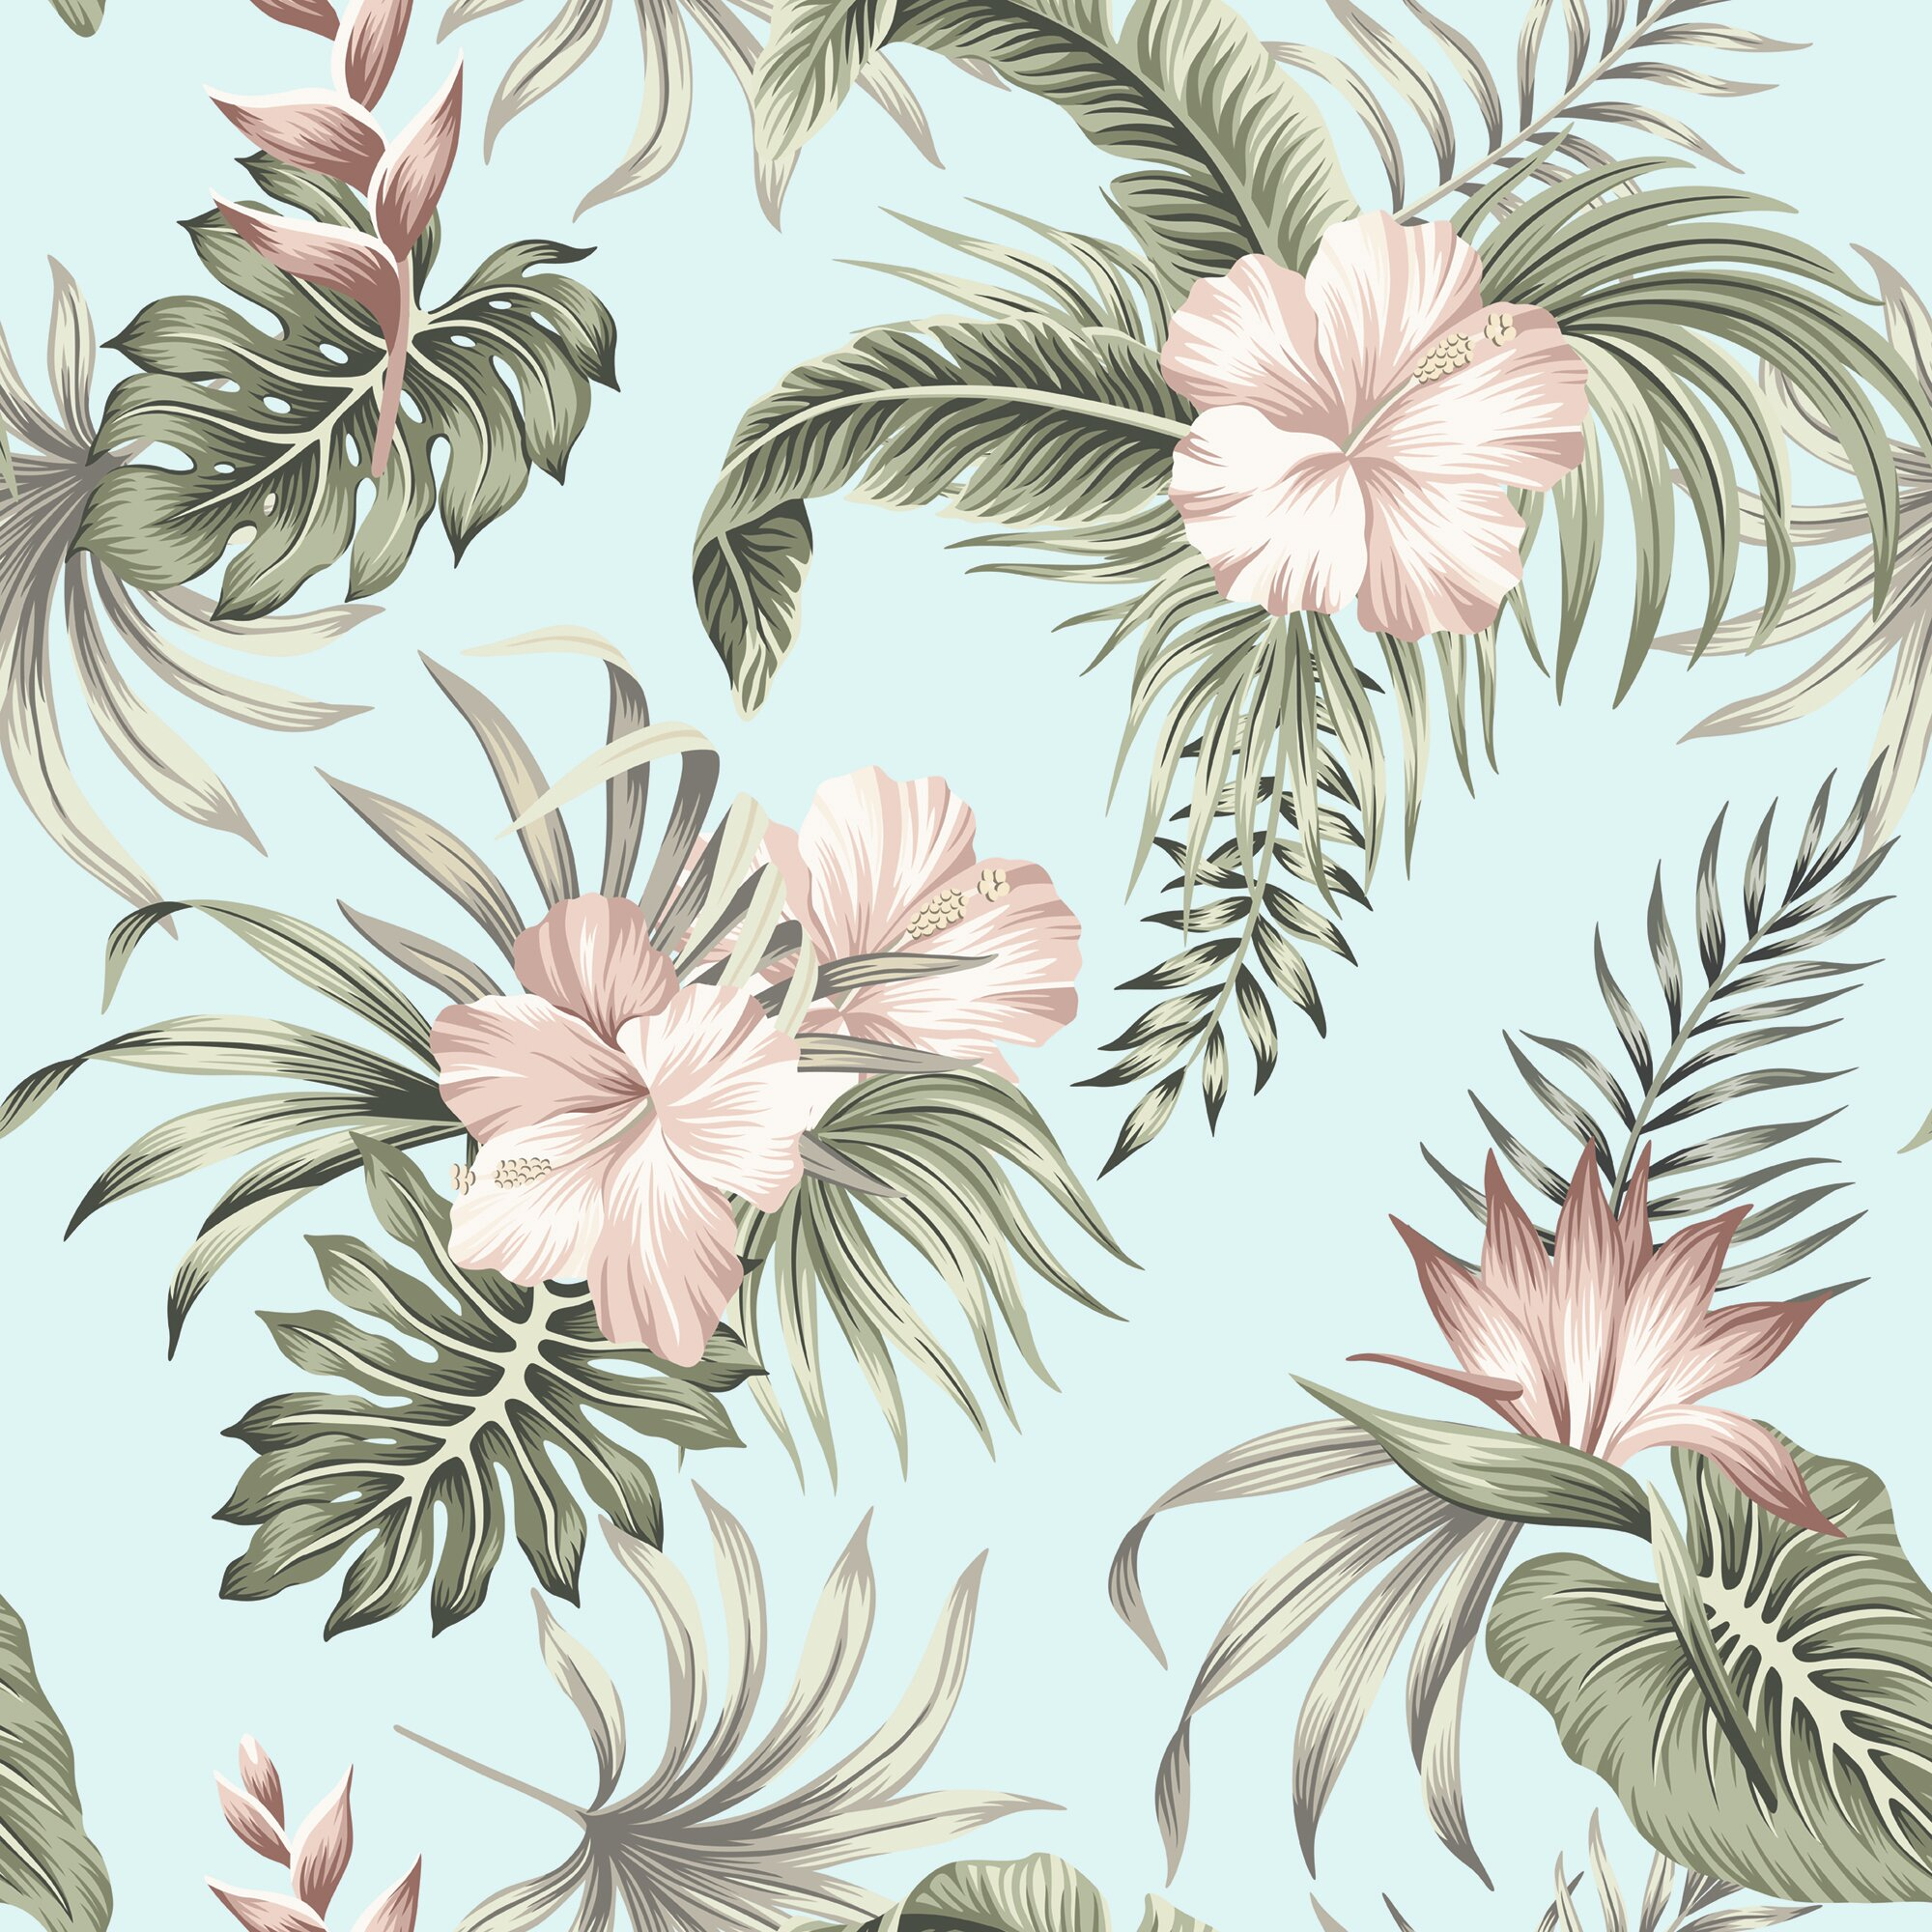 Bay Isle Home Tropical Hibiscus 10 L X 24 W Peel And Stick Wallpaper Roll Wayfair